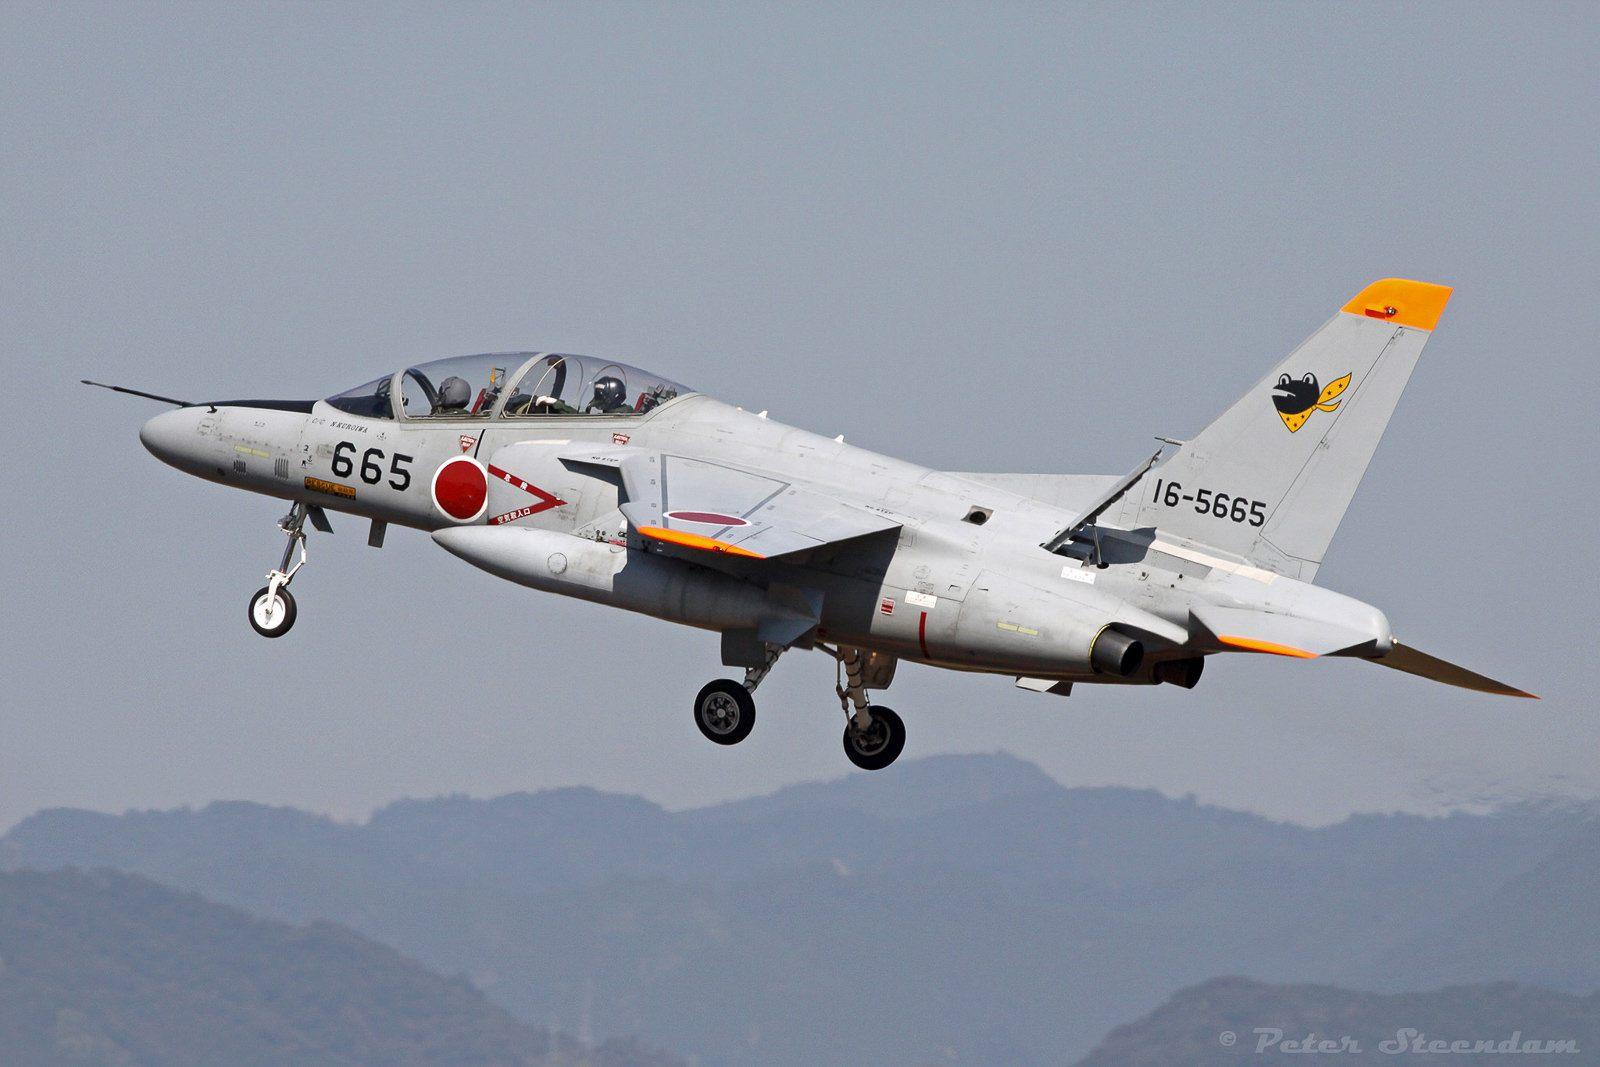 t-4-16-5665-301-tfs-landing_mod_fb